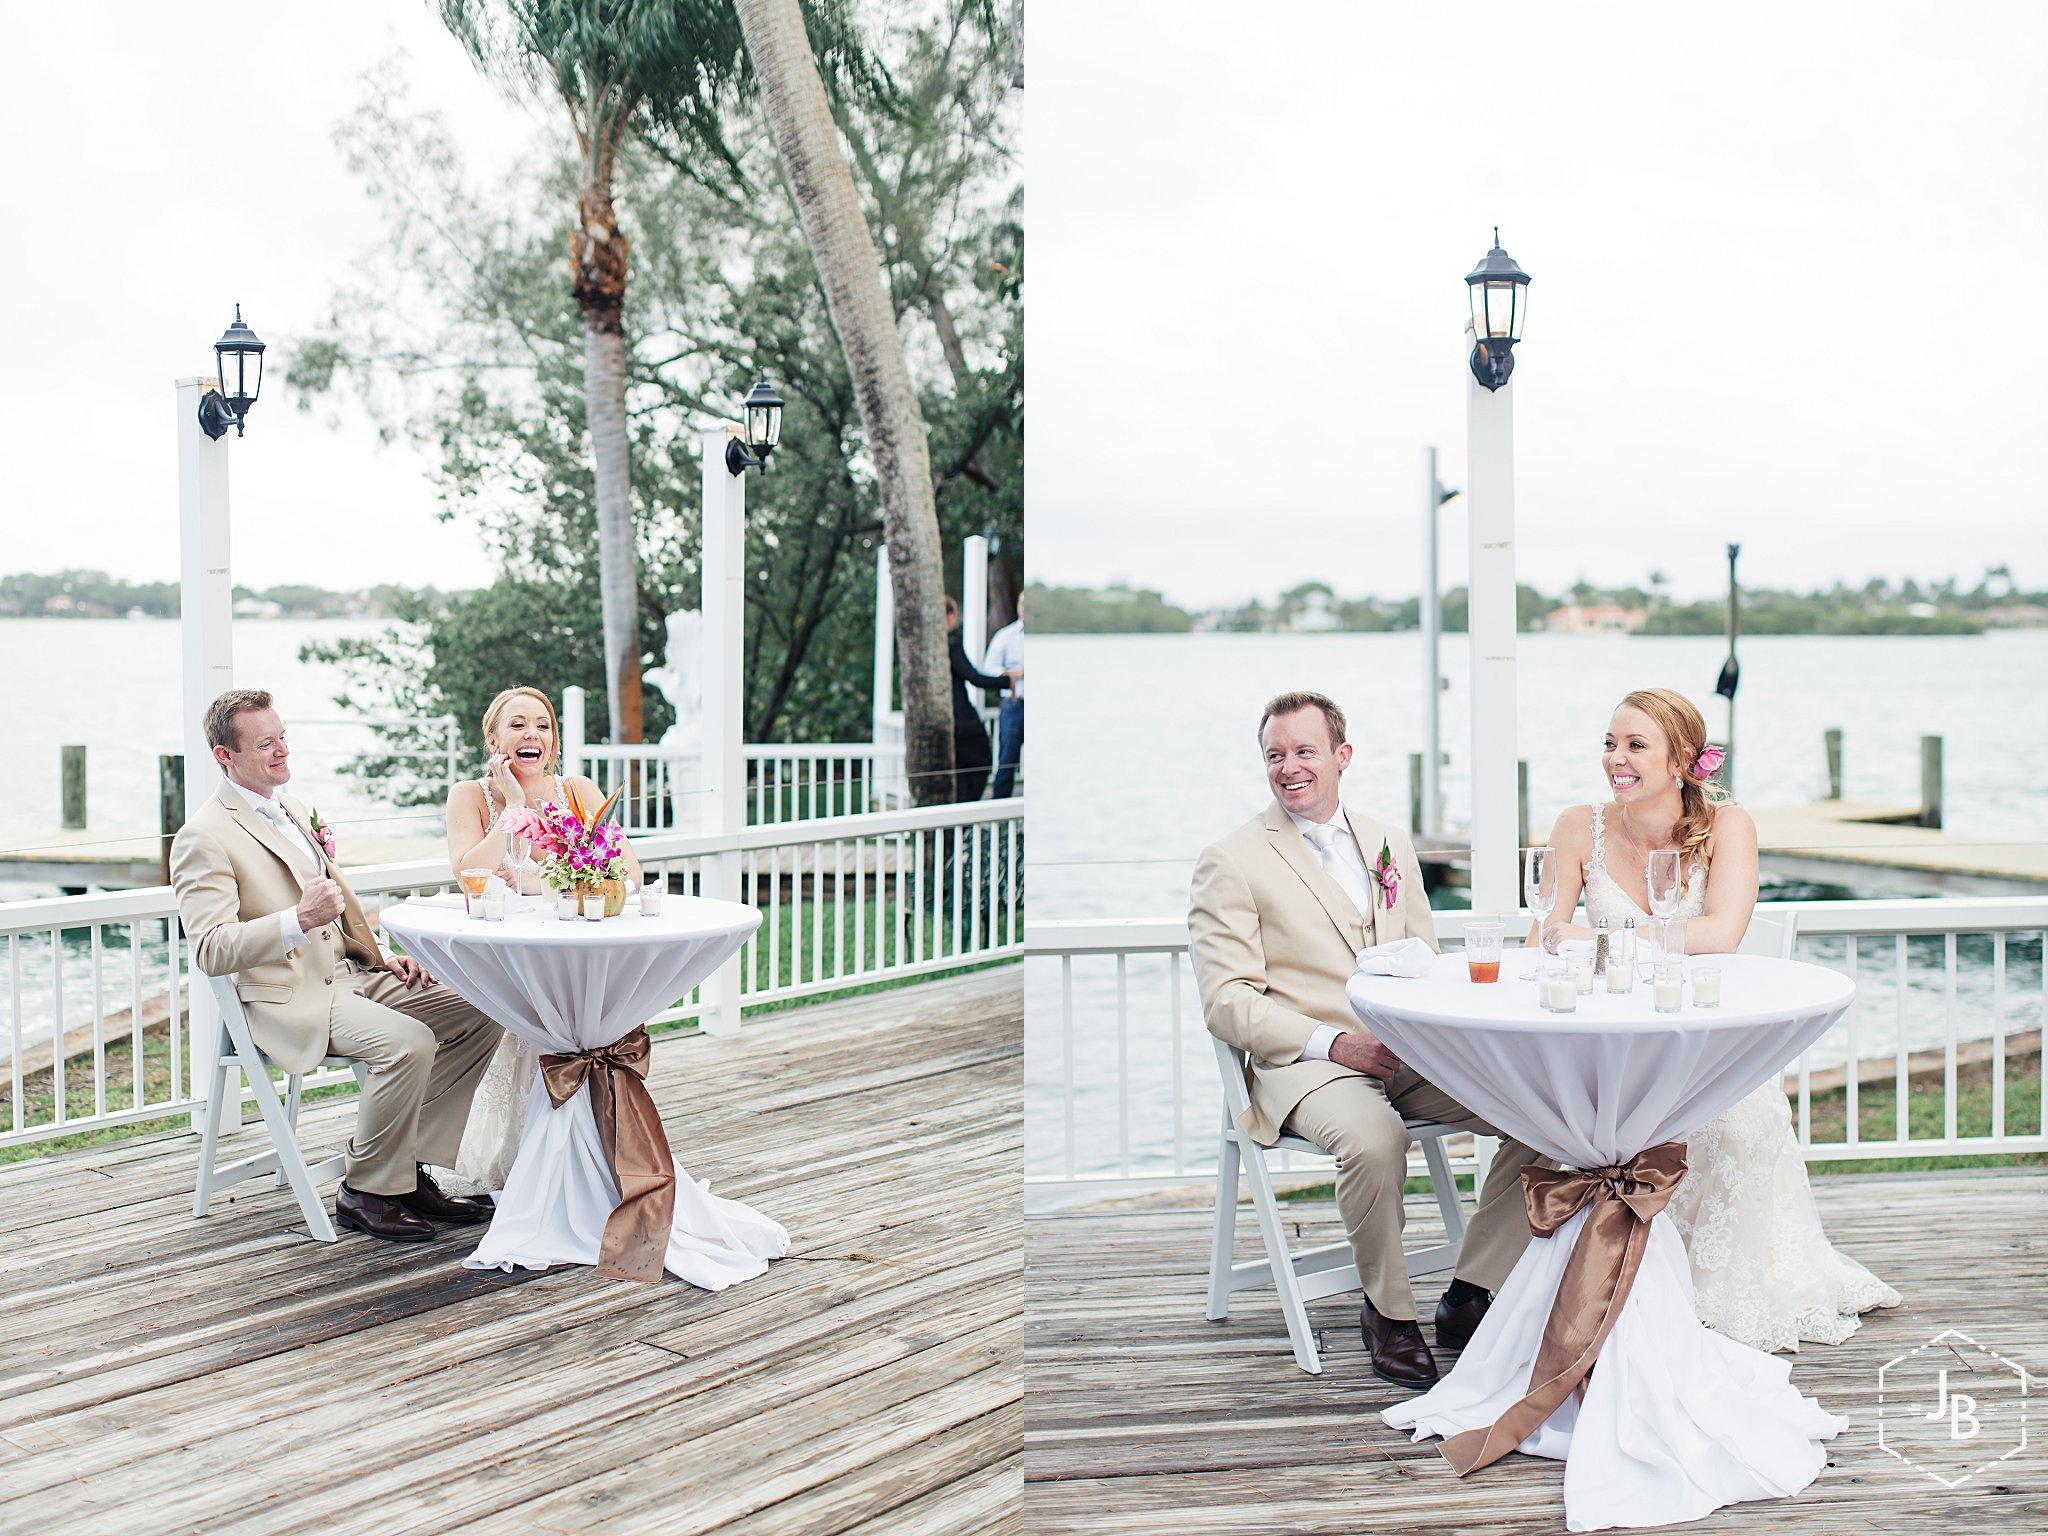 WeddingandEngagementFloridaPhotographer_2089.jpg